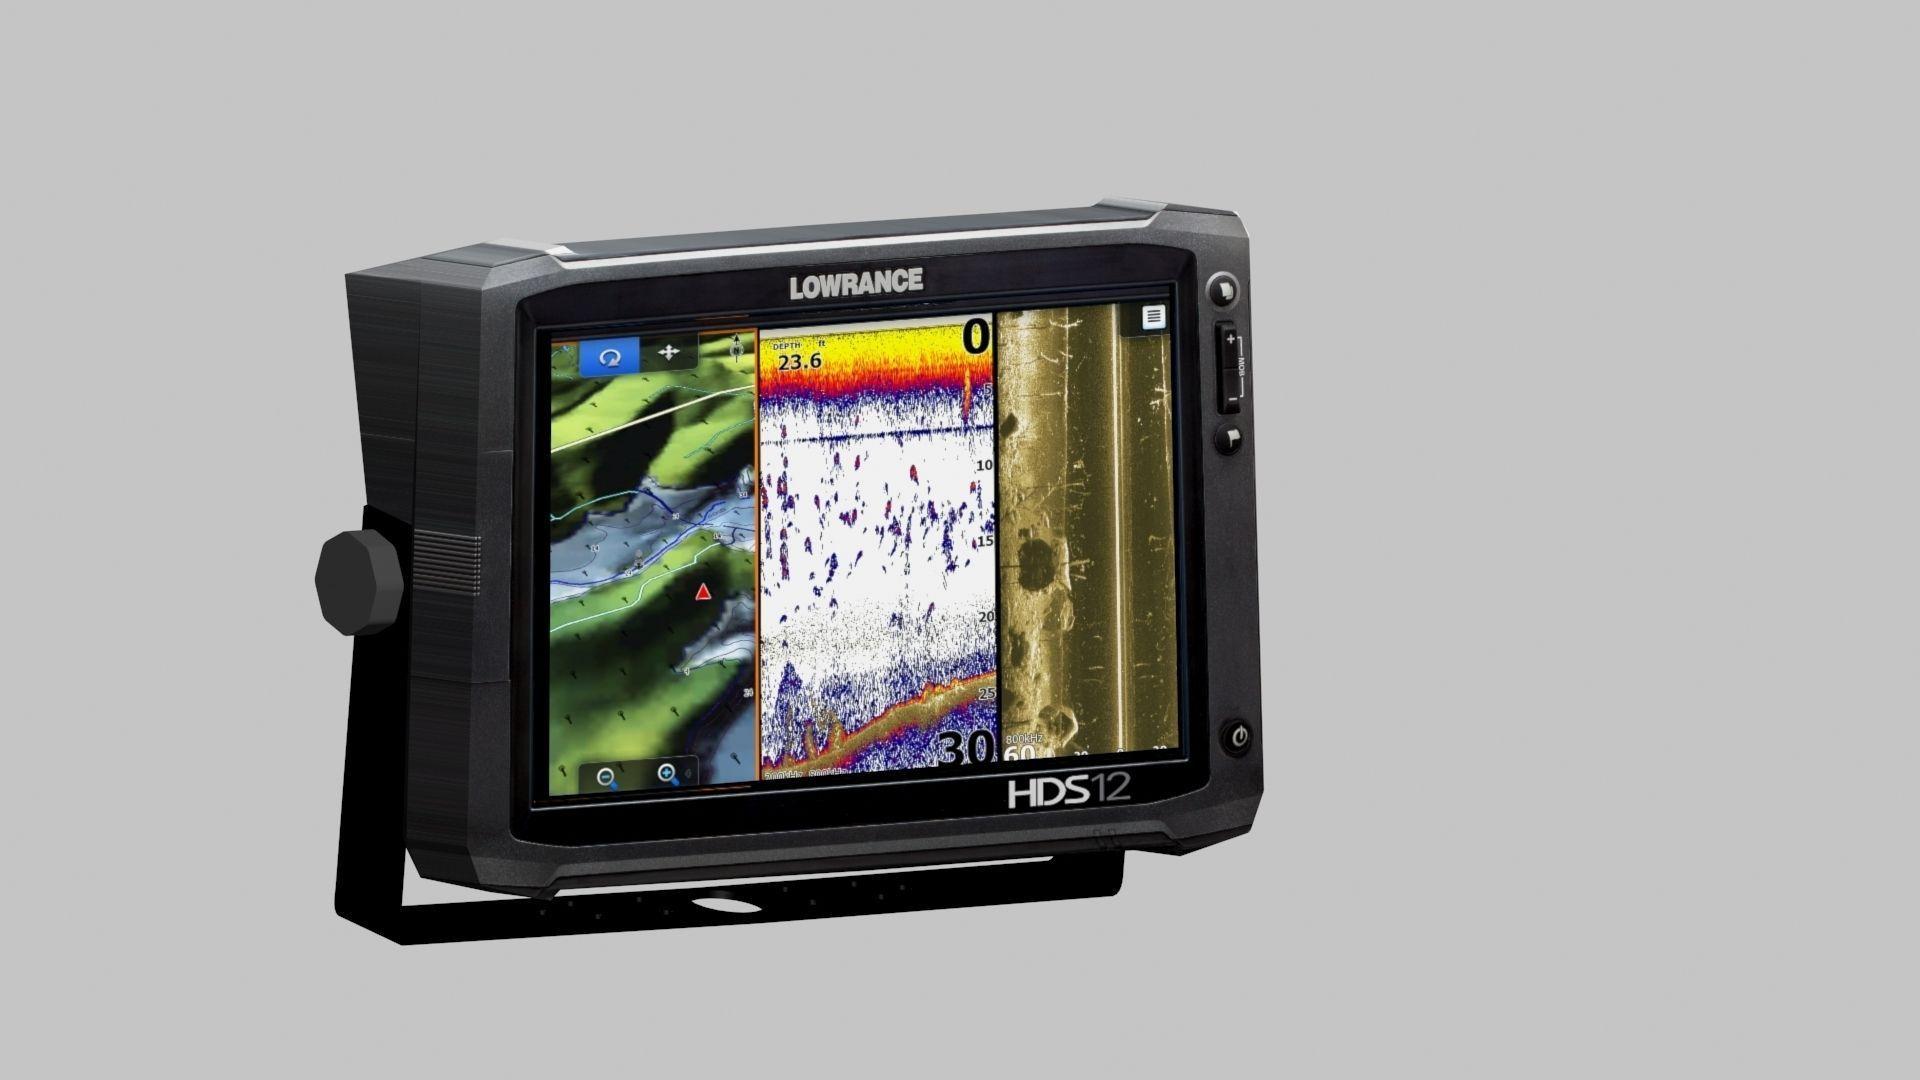 Lowrance fish finder 3d model max tga for Lowrance fish locators